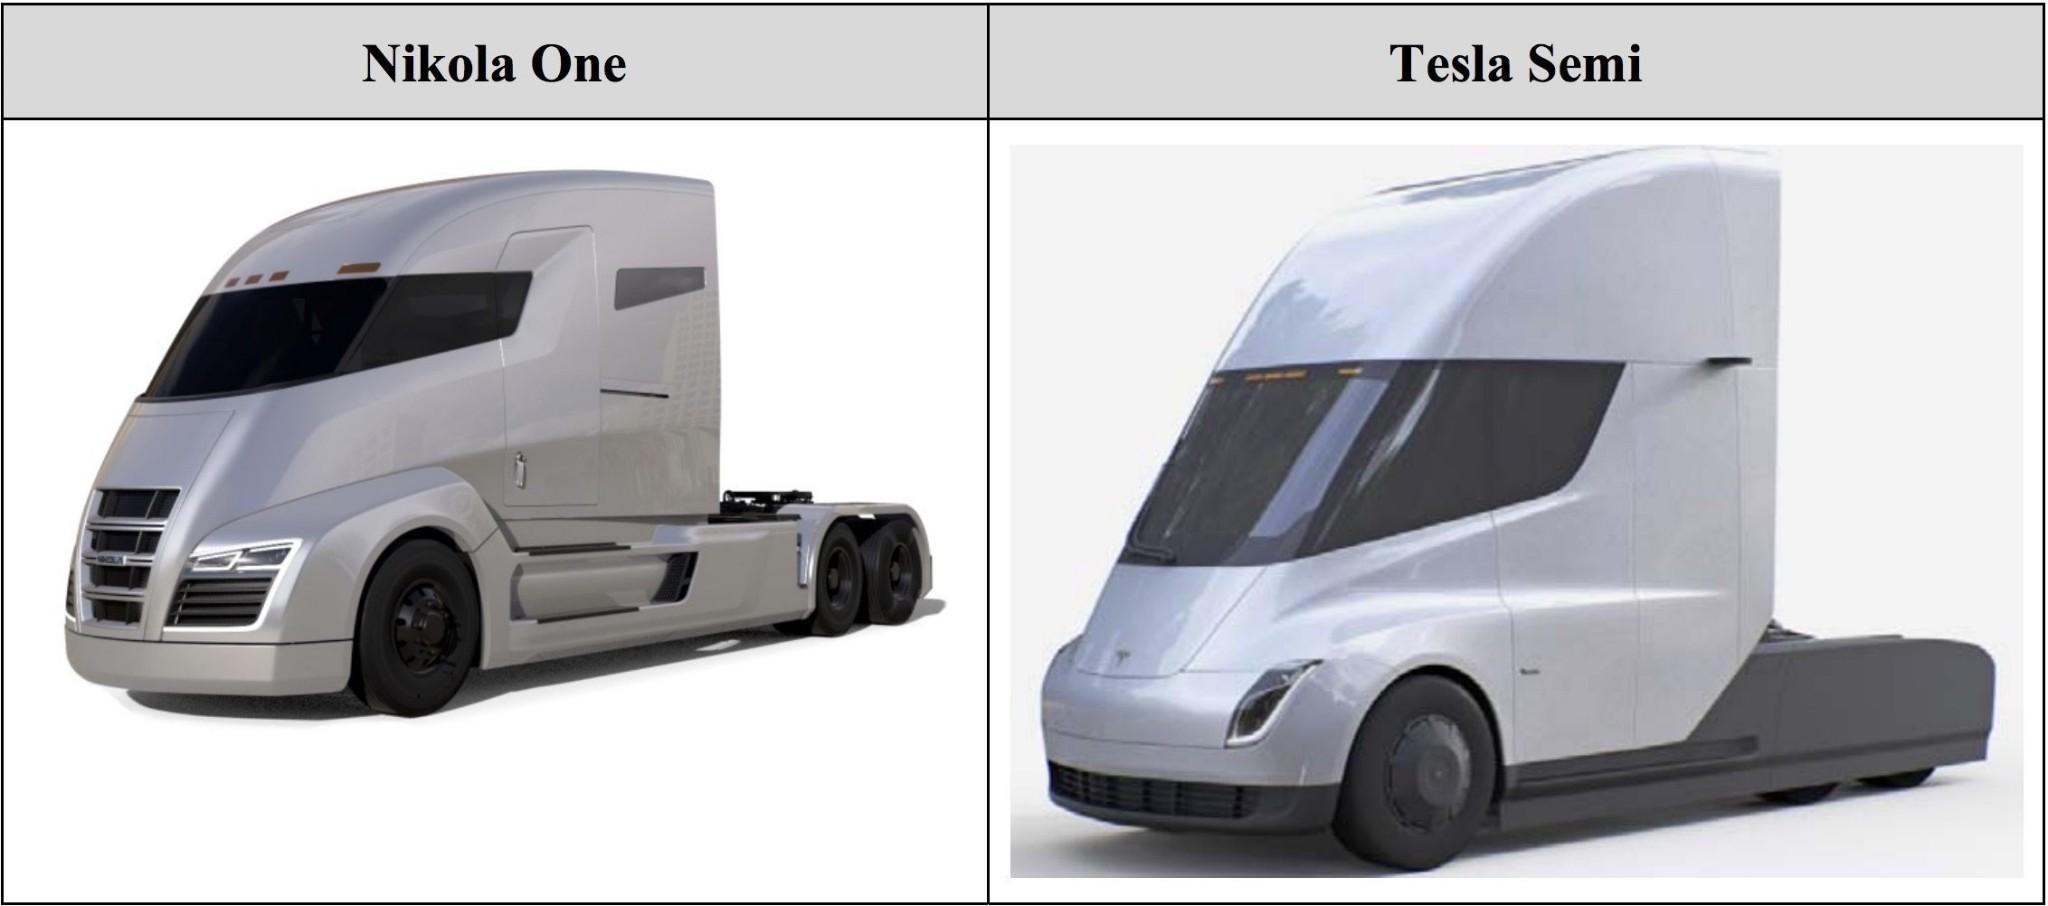 Tesla (TSLA) claims Nikola (NKLA) stole its truck design from Rimac designer - Electrek